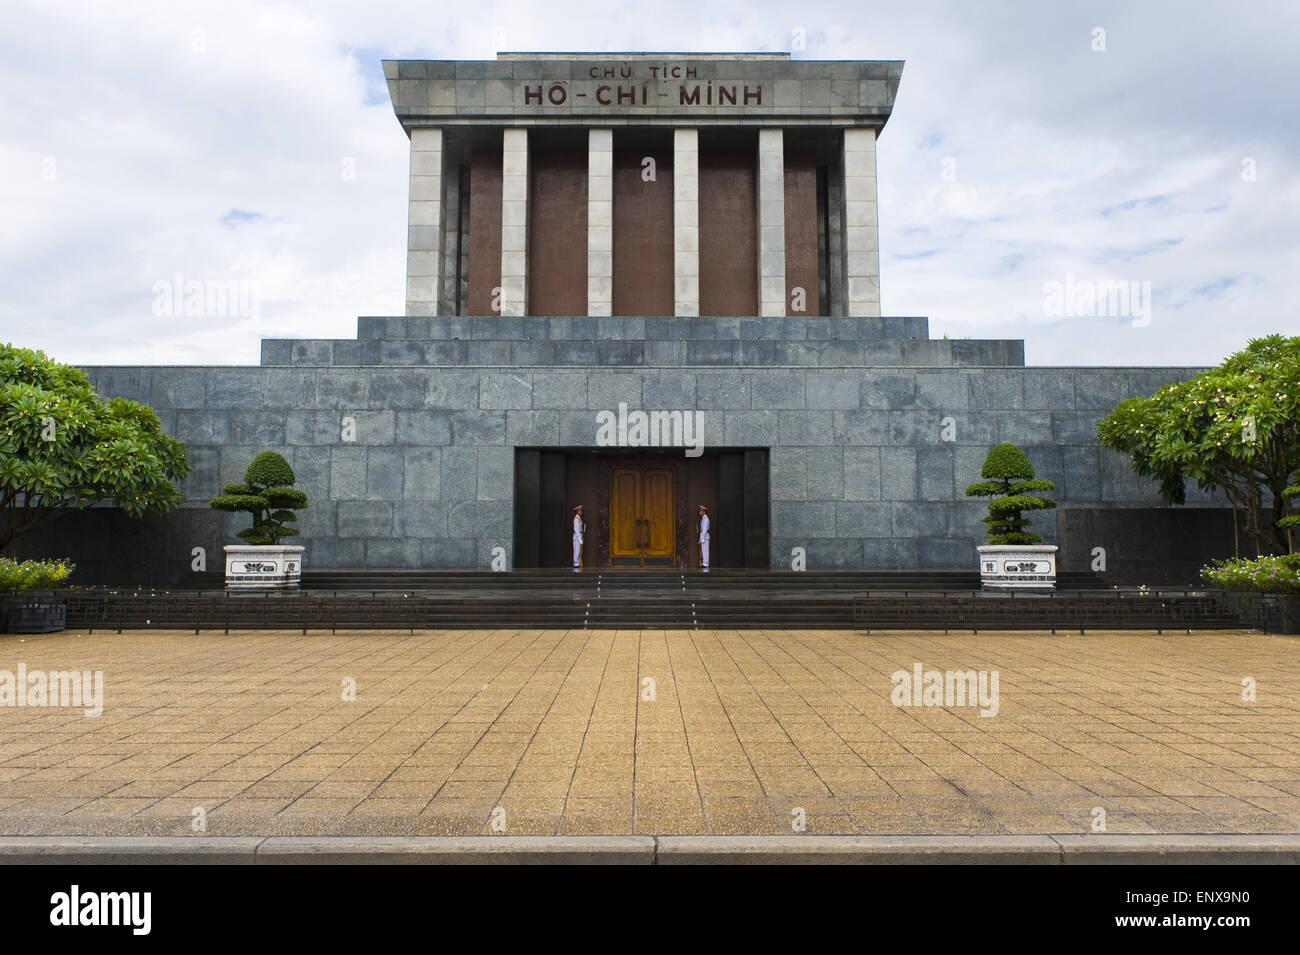 Ho Chi Minh Mausoleum - Hanoi, Vietnam - Stock Image